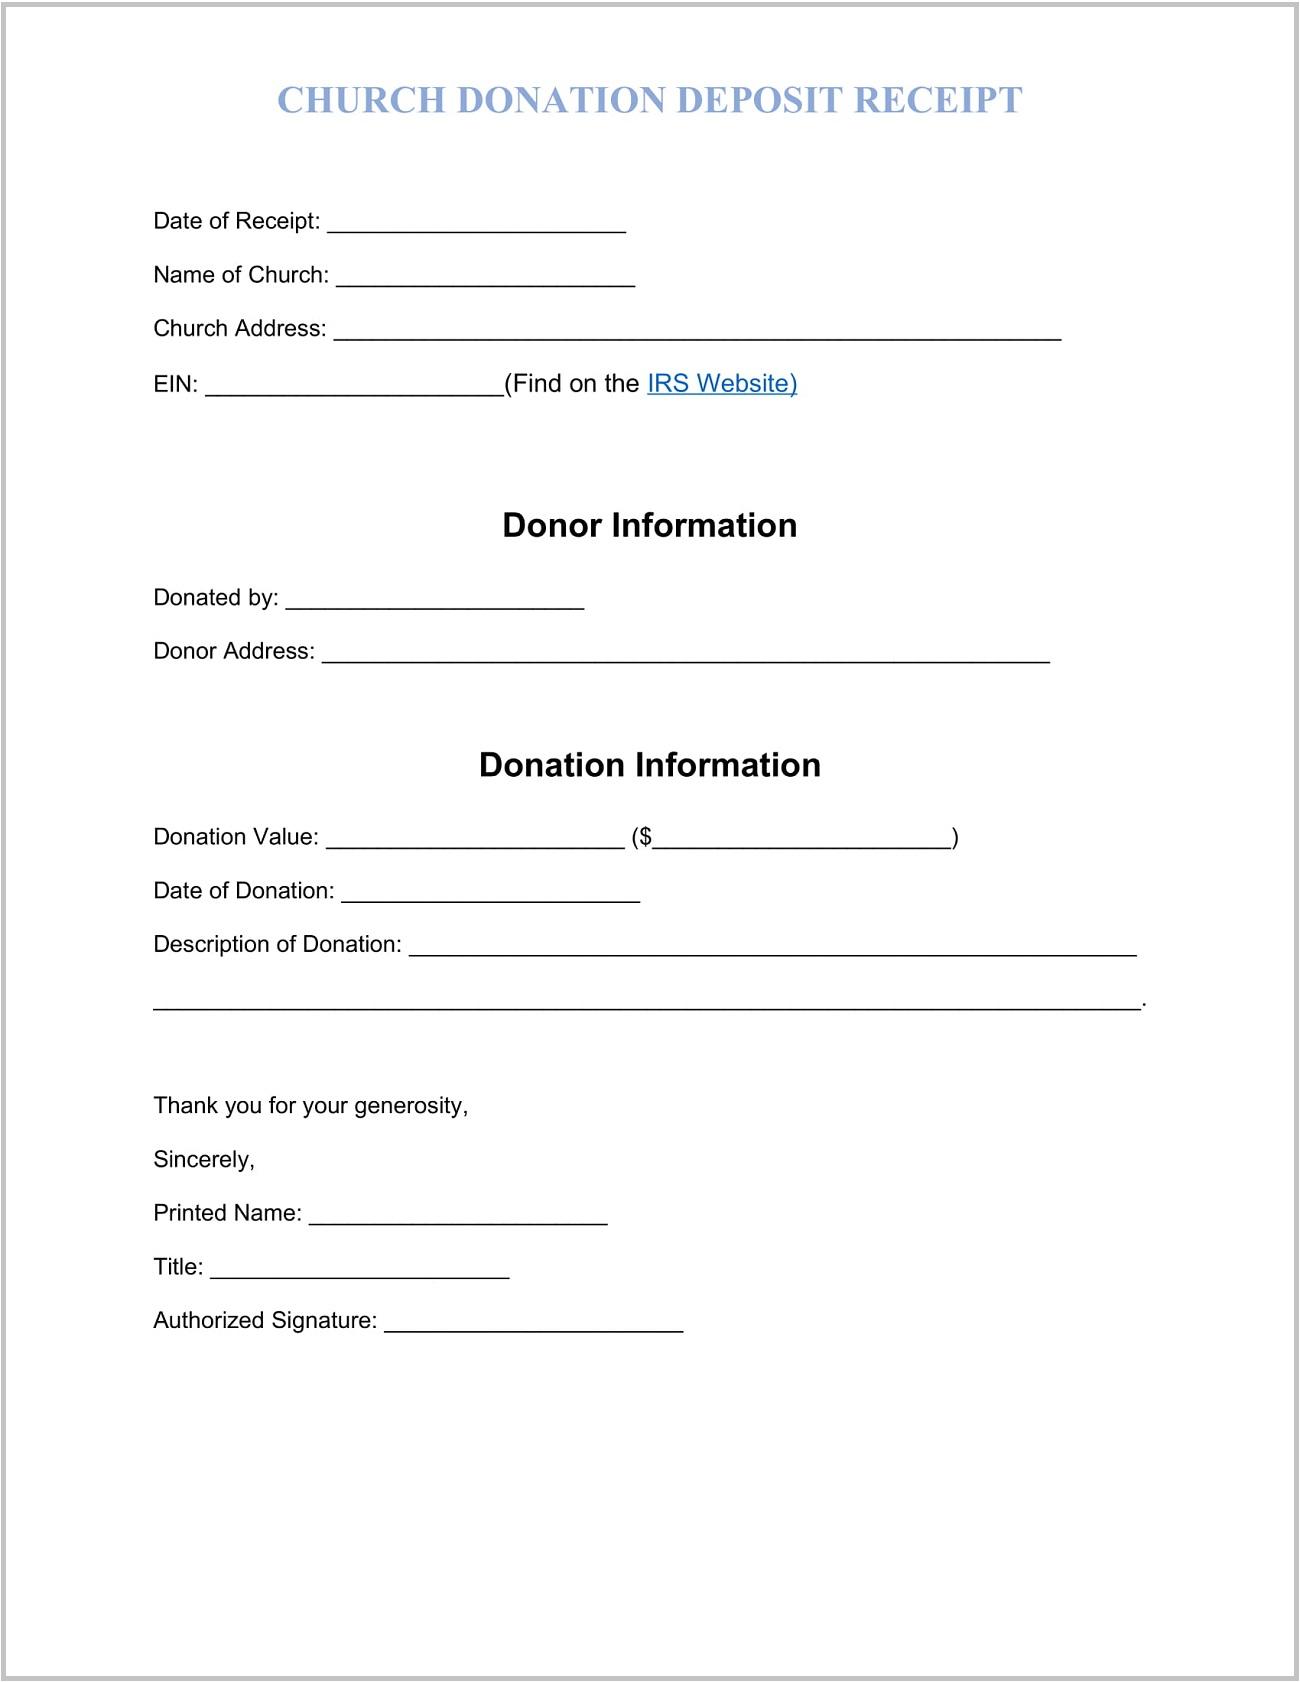 Church Donation Receipt Template Word